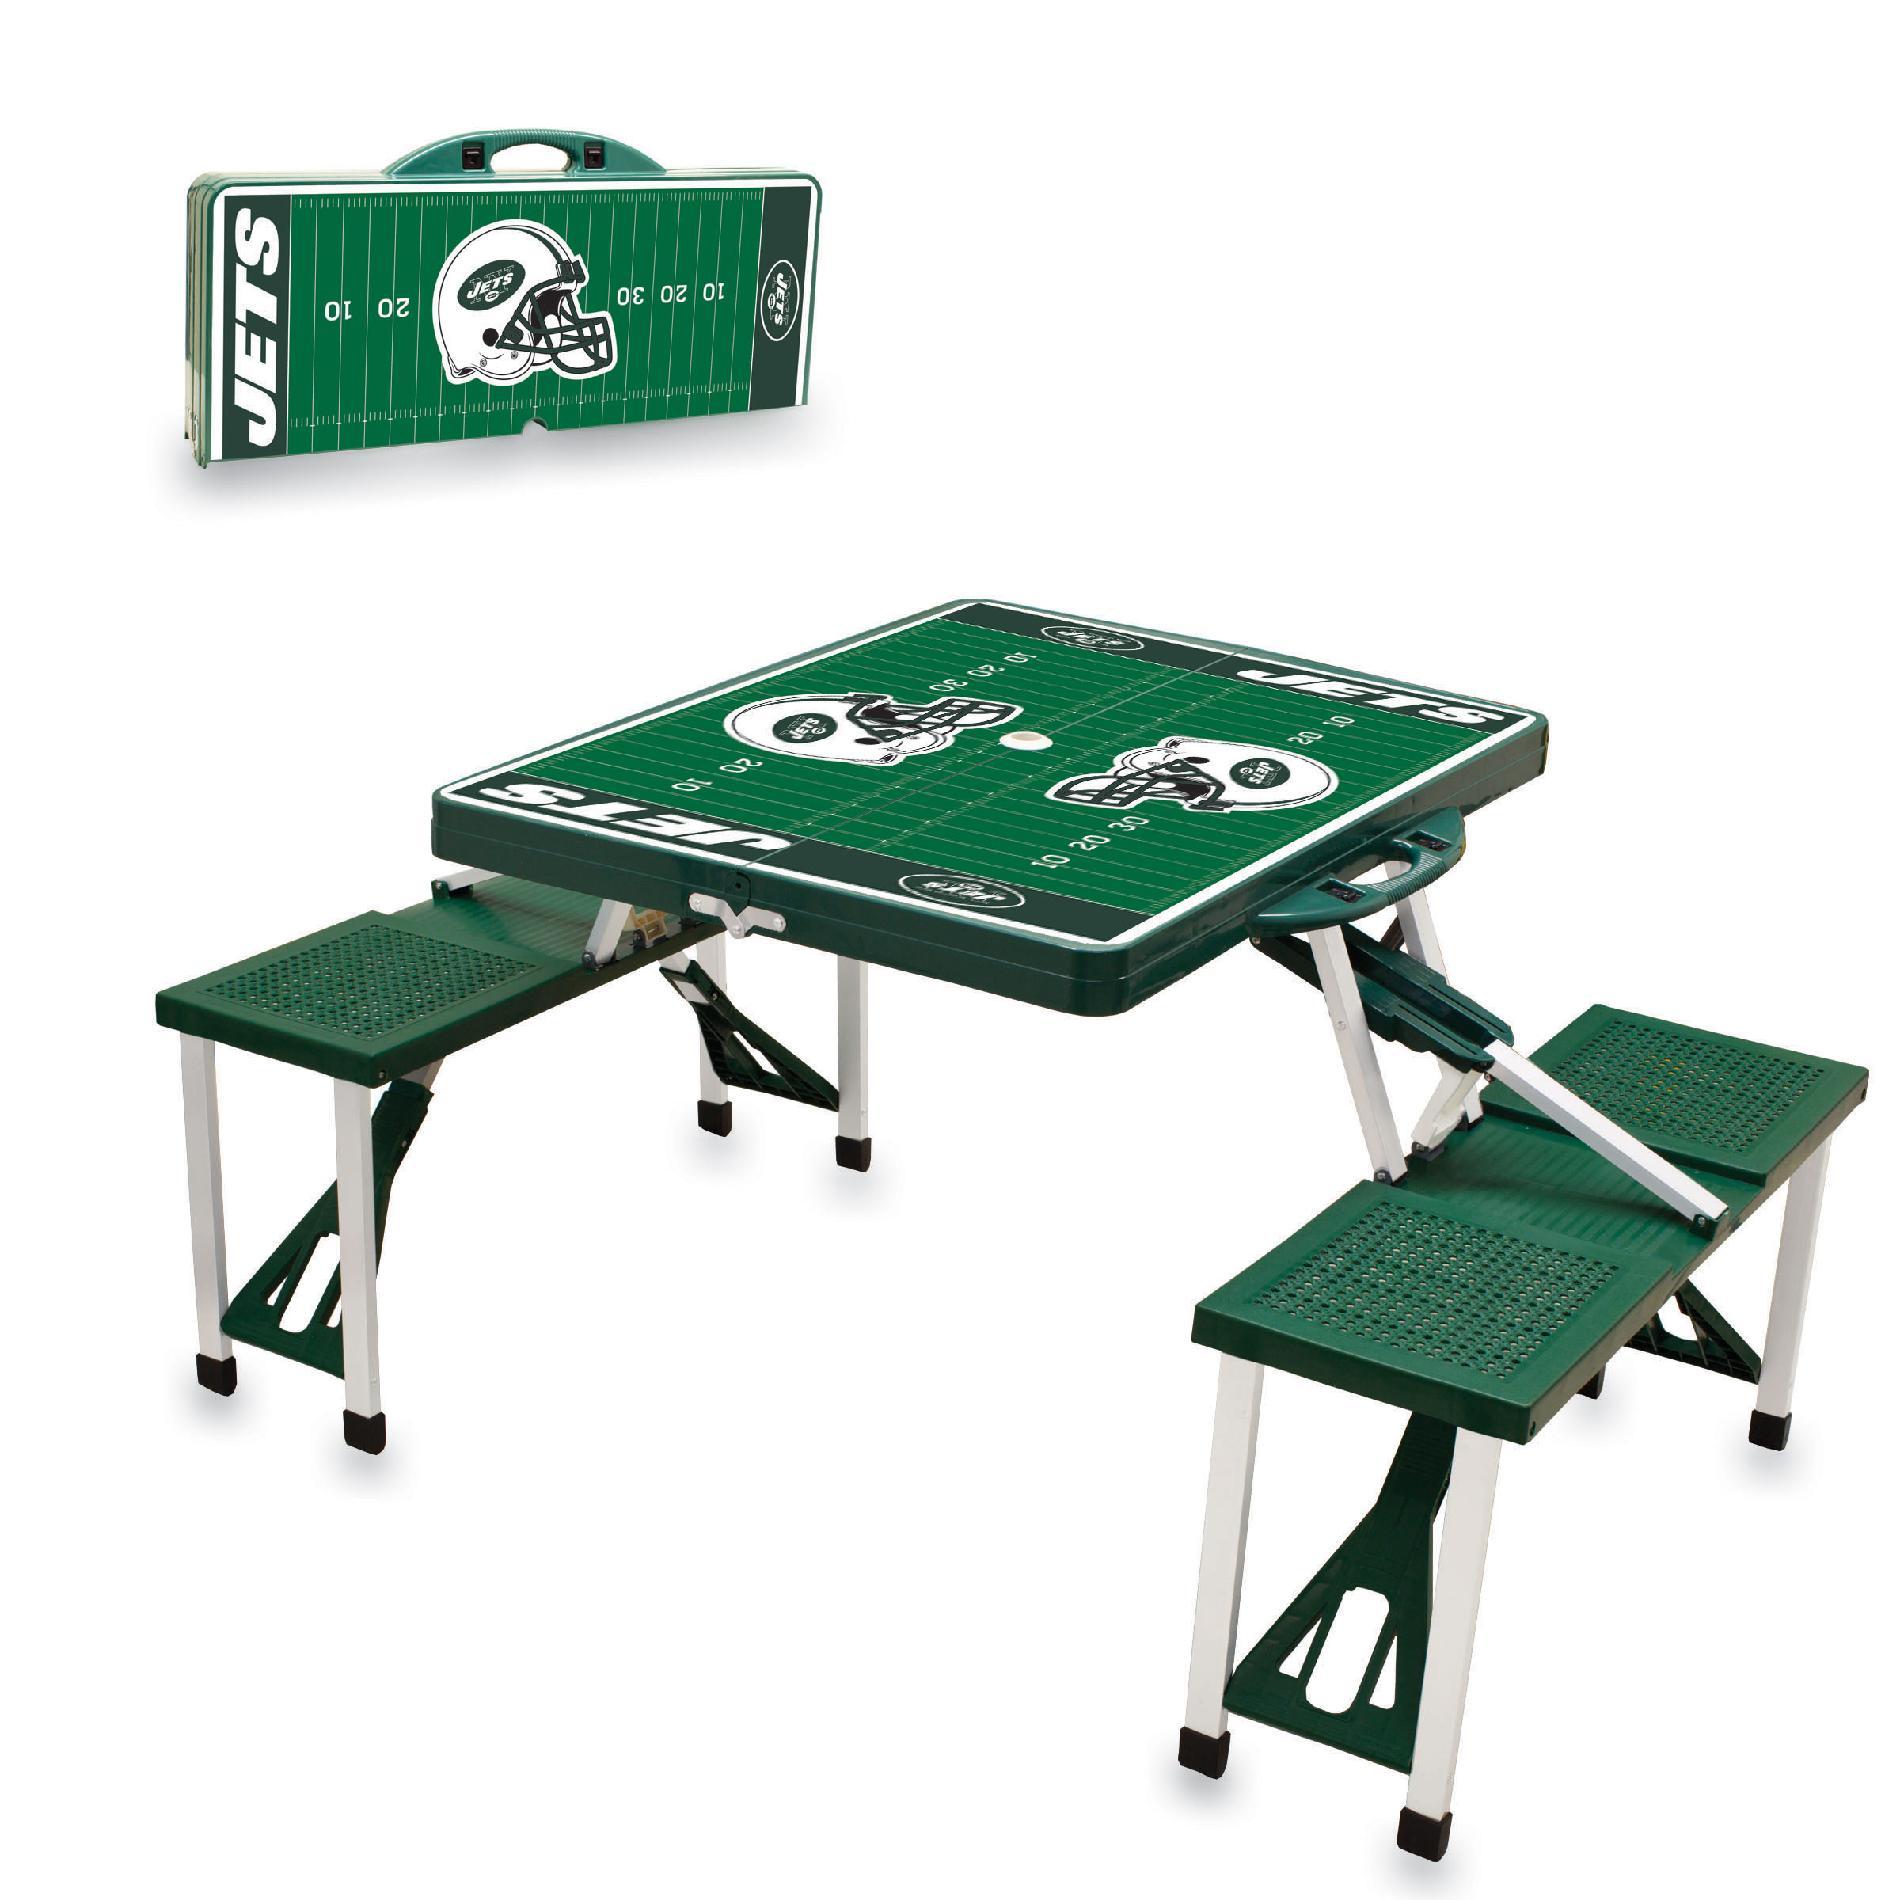 Picnic Time Picnic Table Sport - New York Jets PartNumber: 00664913000P KsnValue: 7309923 MfgPartNumber: 811-00-121-225-2